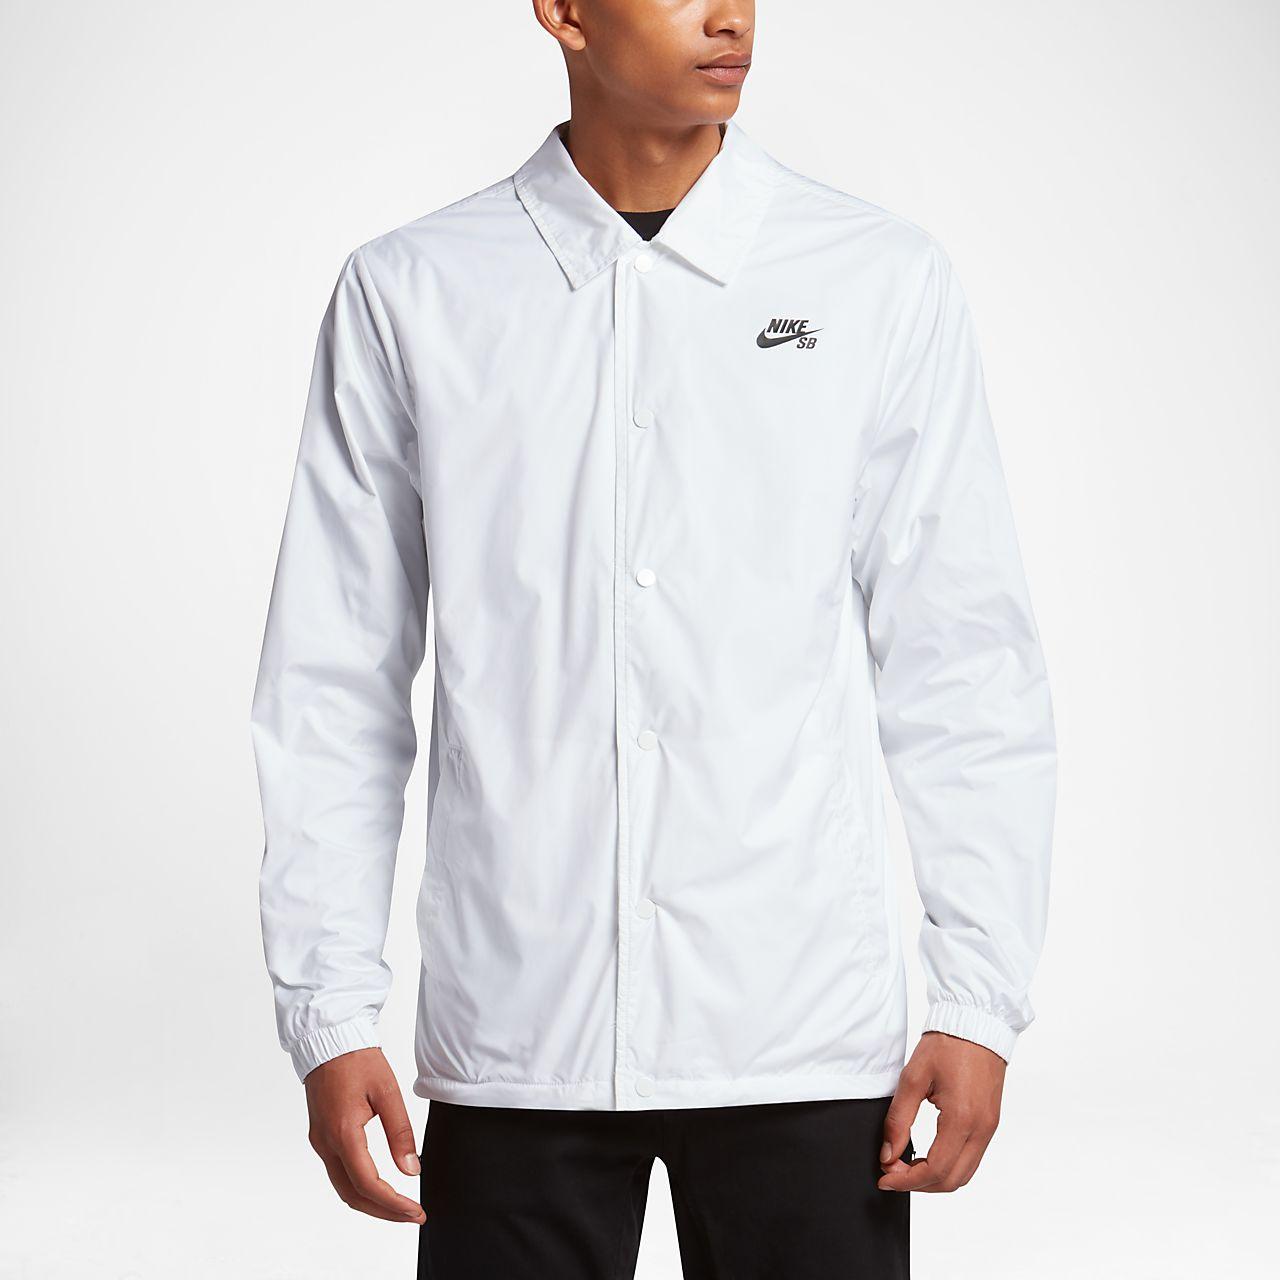 Nike SB Shield Coaches Men's Jackets White/Anthracite